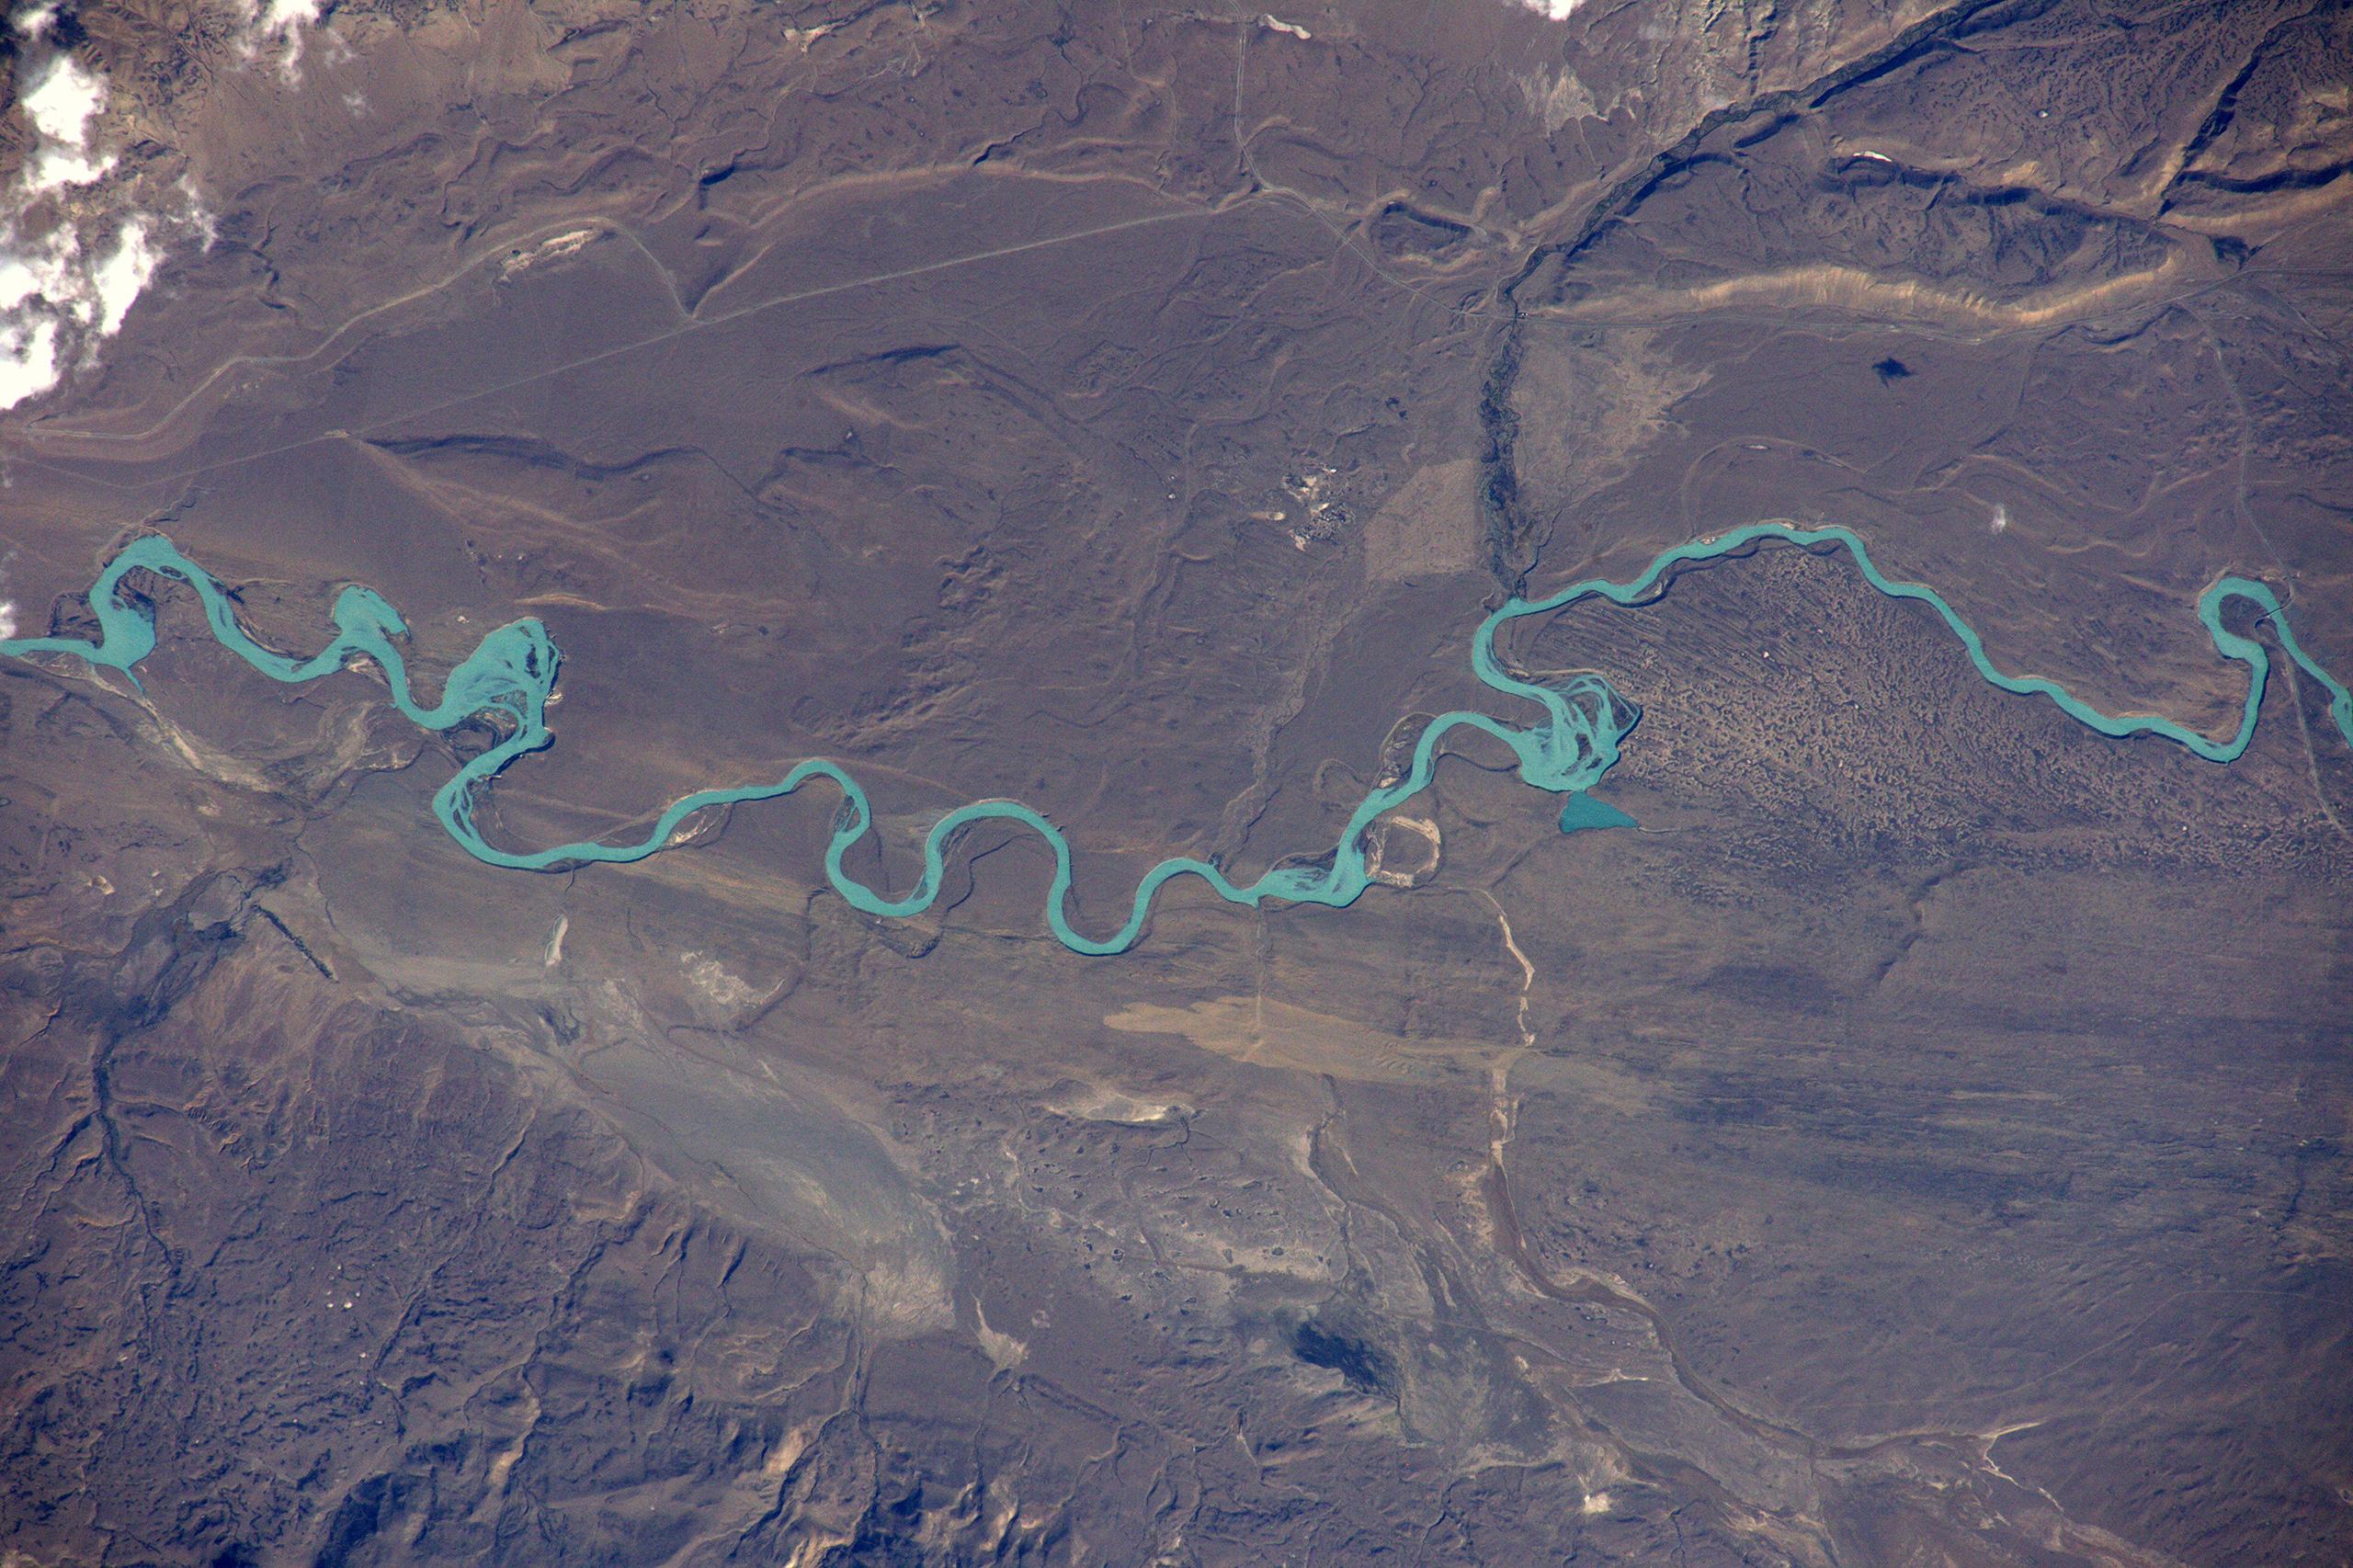 Rio Santa Cruz carries glacial river water into Lago Argentina, Patagonia, March 23, 2016.